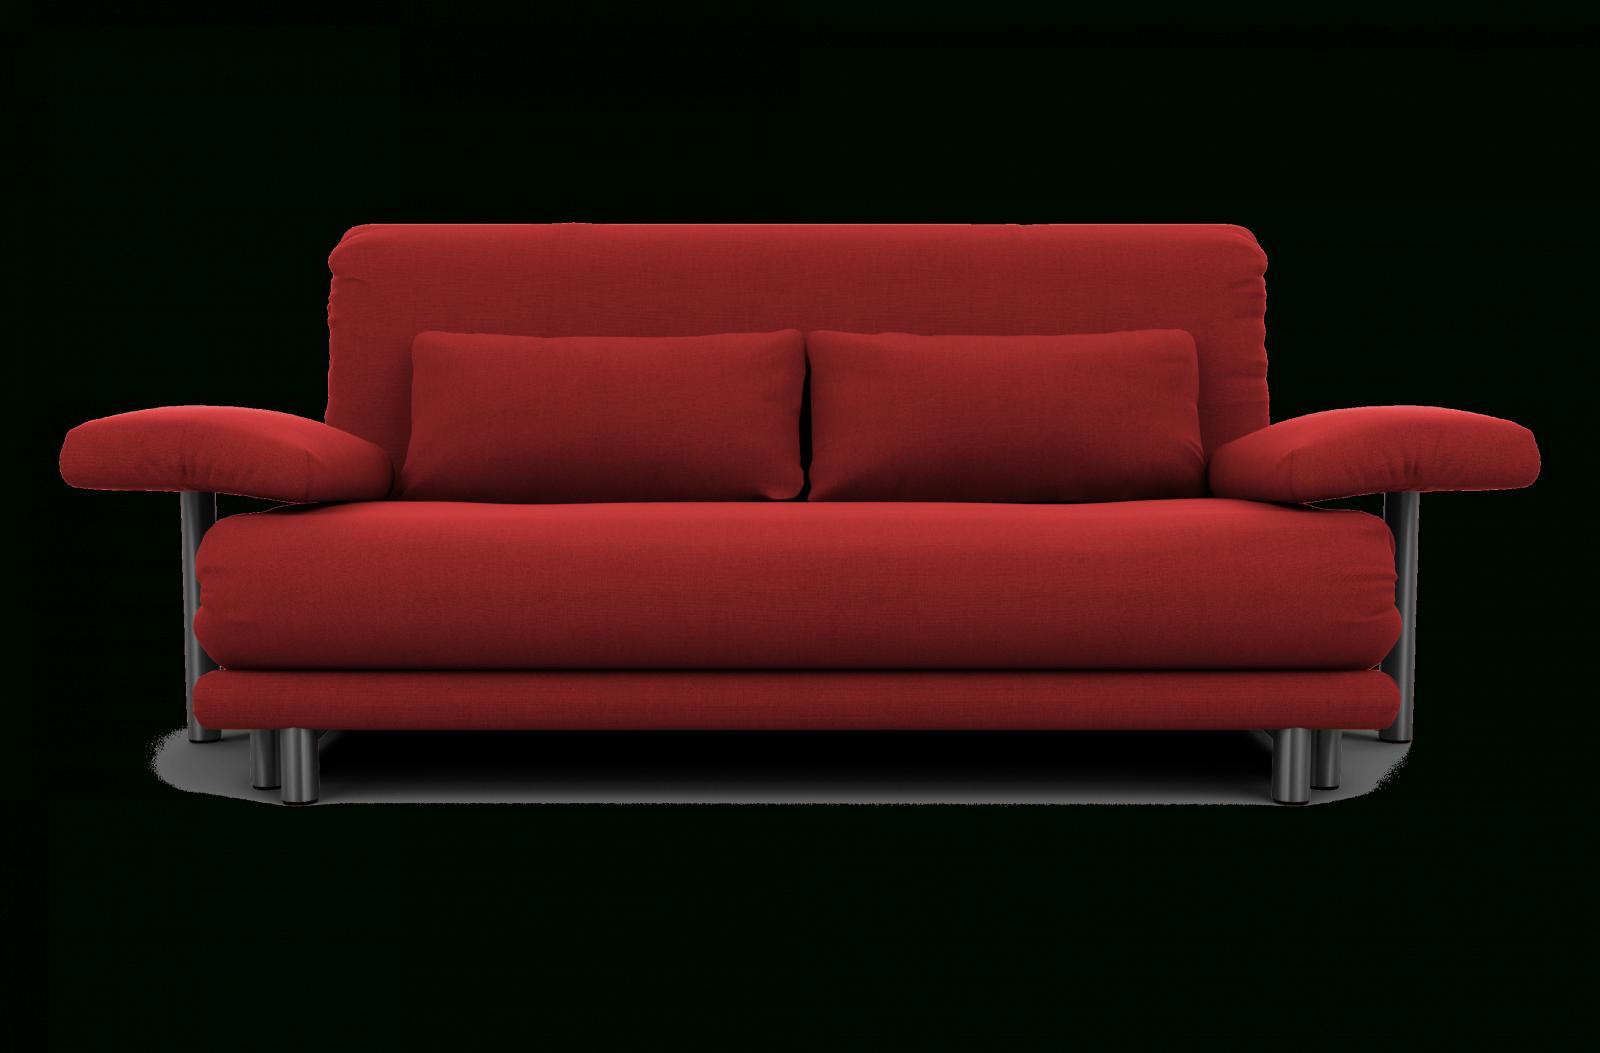 Multy Sofa Beds From Designer  Claude Brisson  Ligne Roset von Ligne Roset Schlafsofa Multy Photo